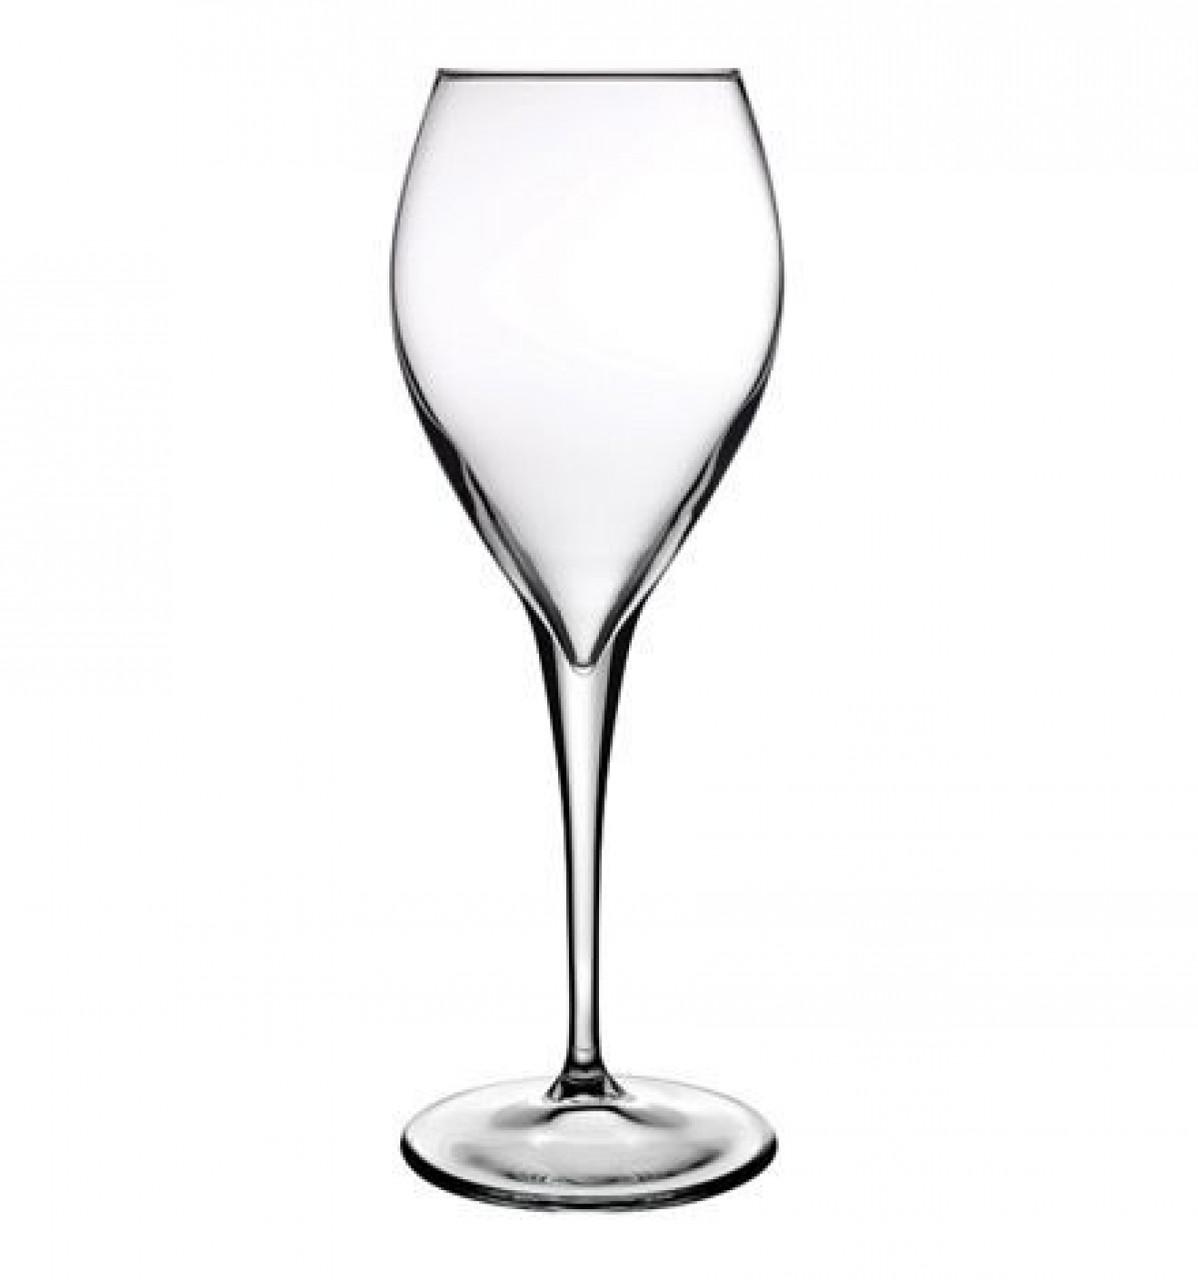 Набор бокалов для вина 445 мл. Монте Карло Pasabahce,6 шт